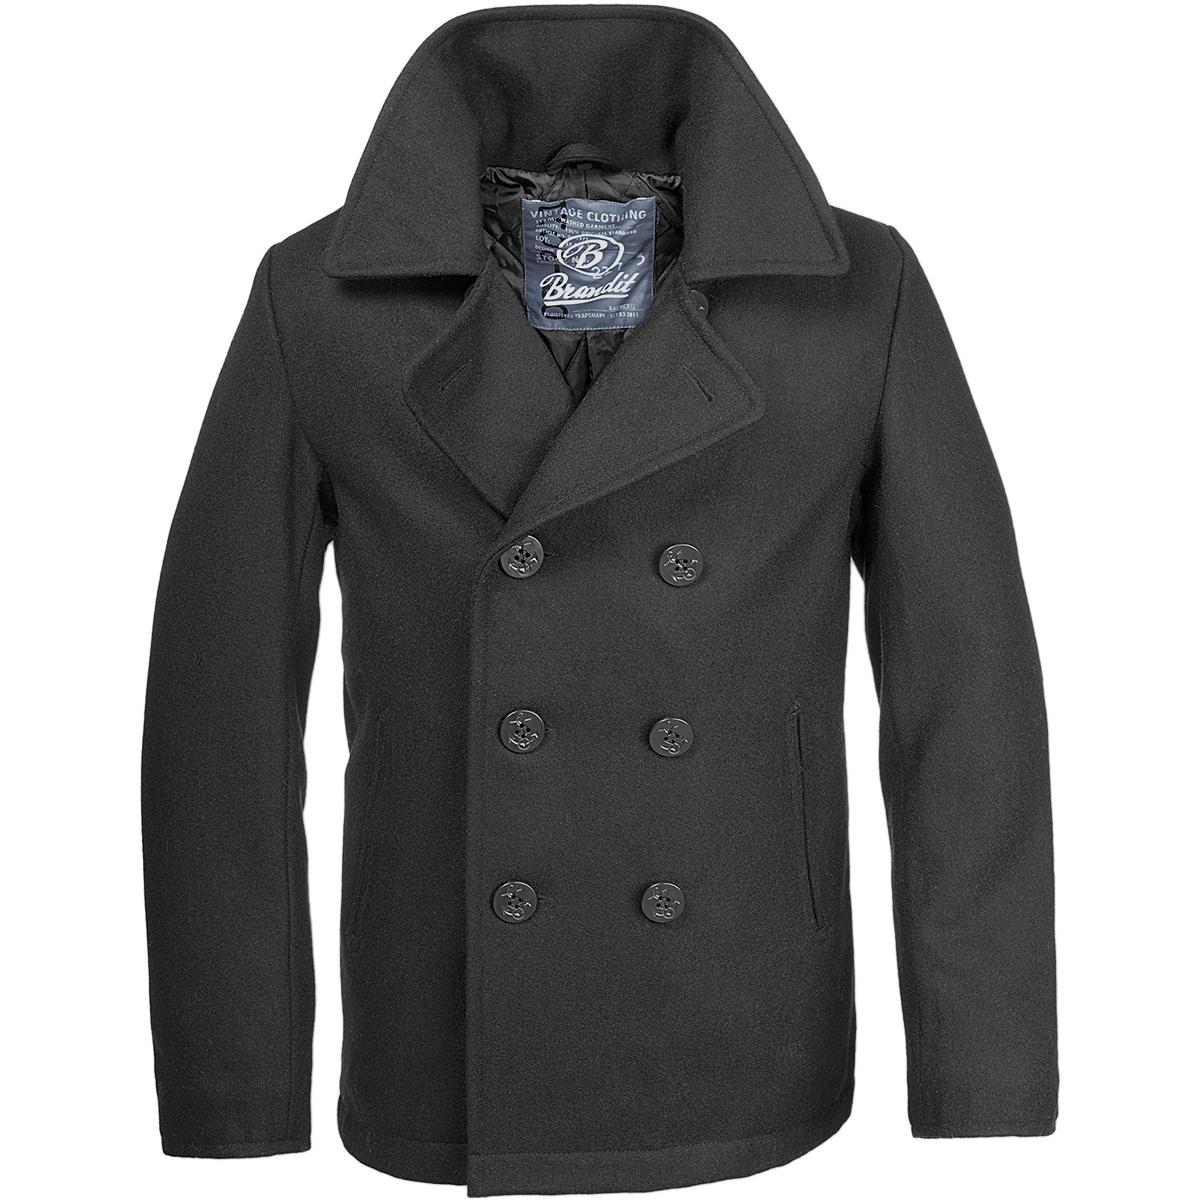 Brandit Pea Coat Black   Coat